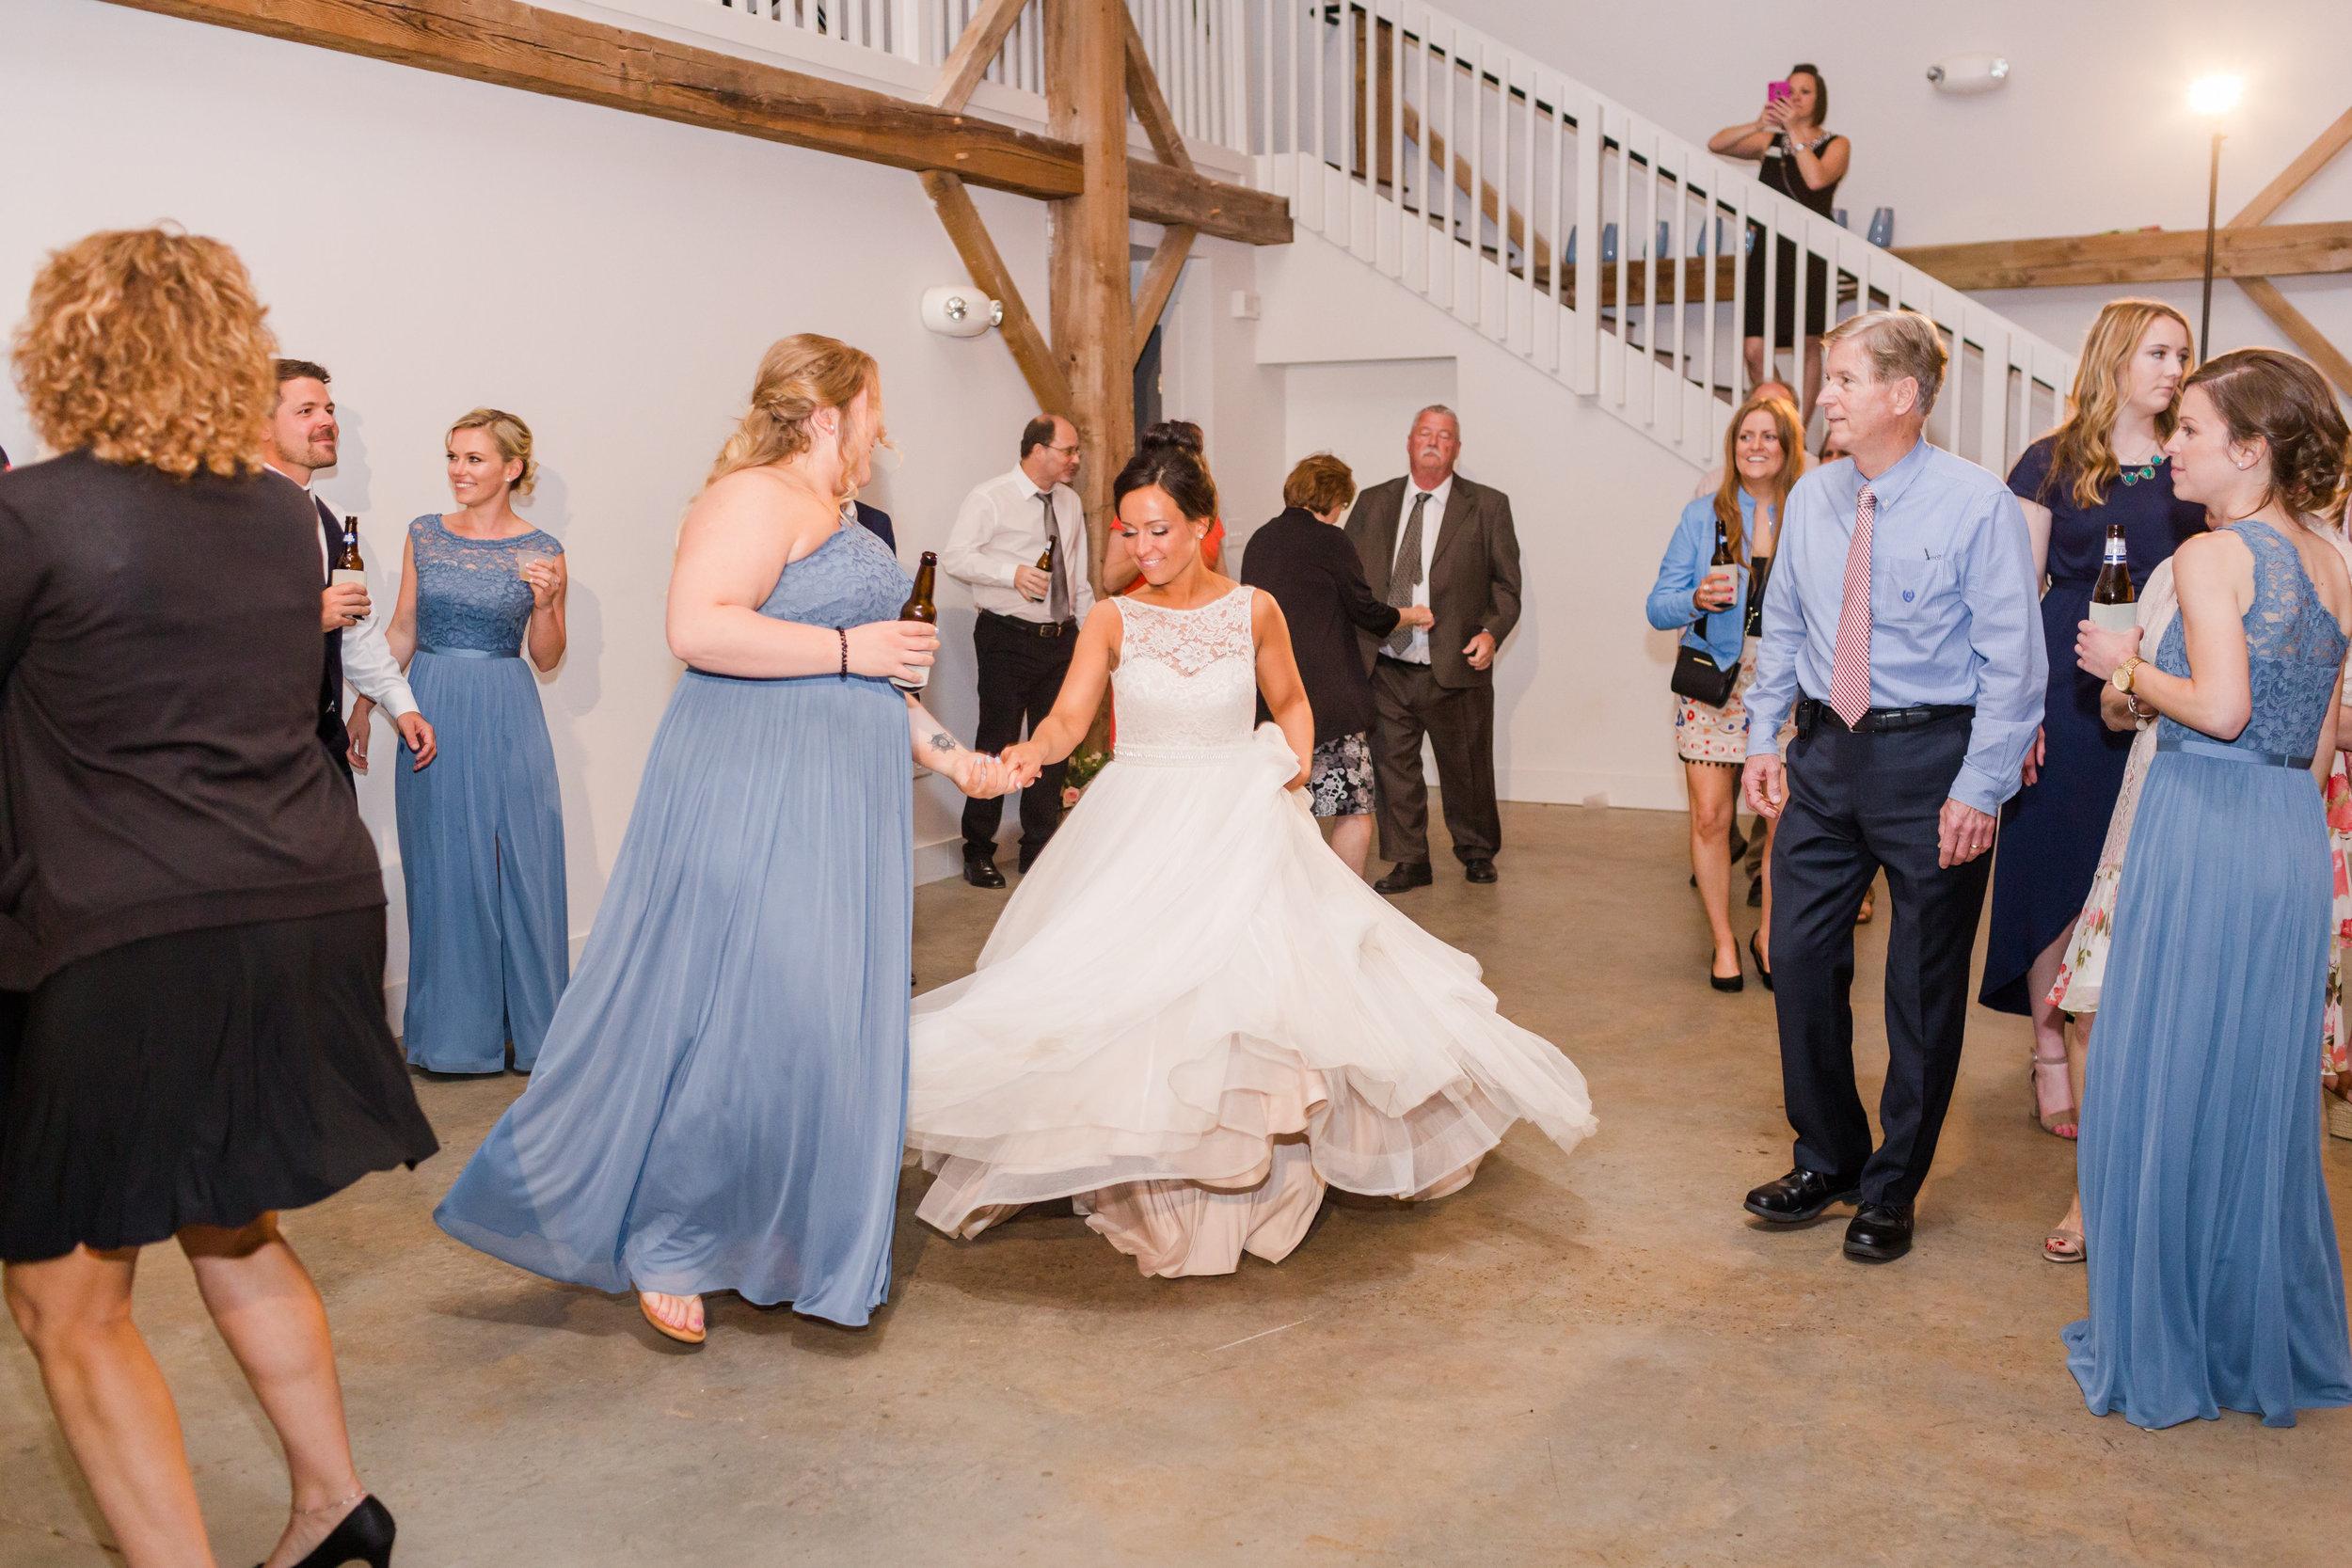 Alex Blair Wedding-Alex Blair Wedding 2-0344.jpg